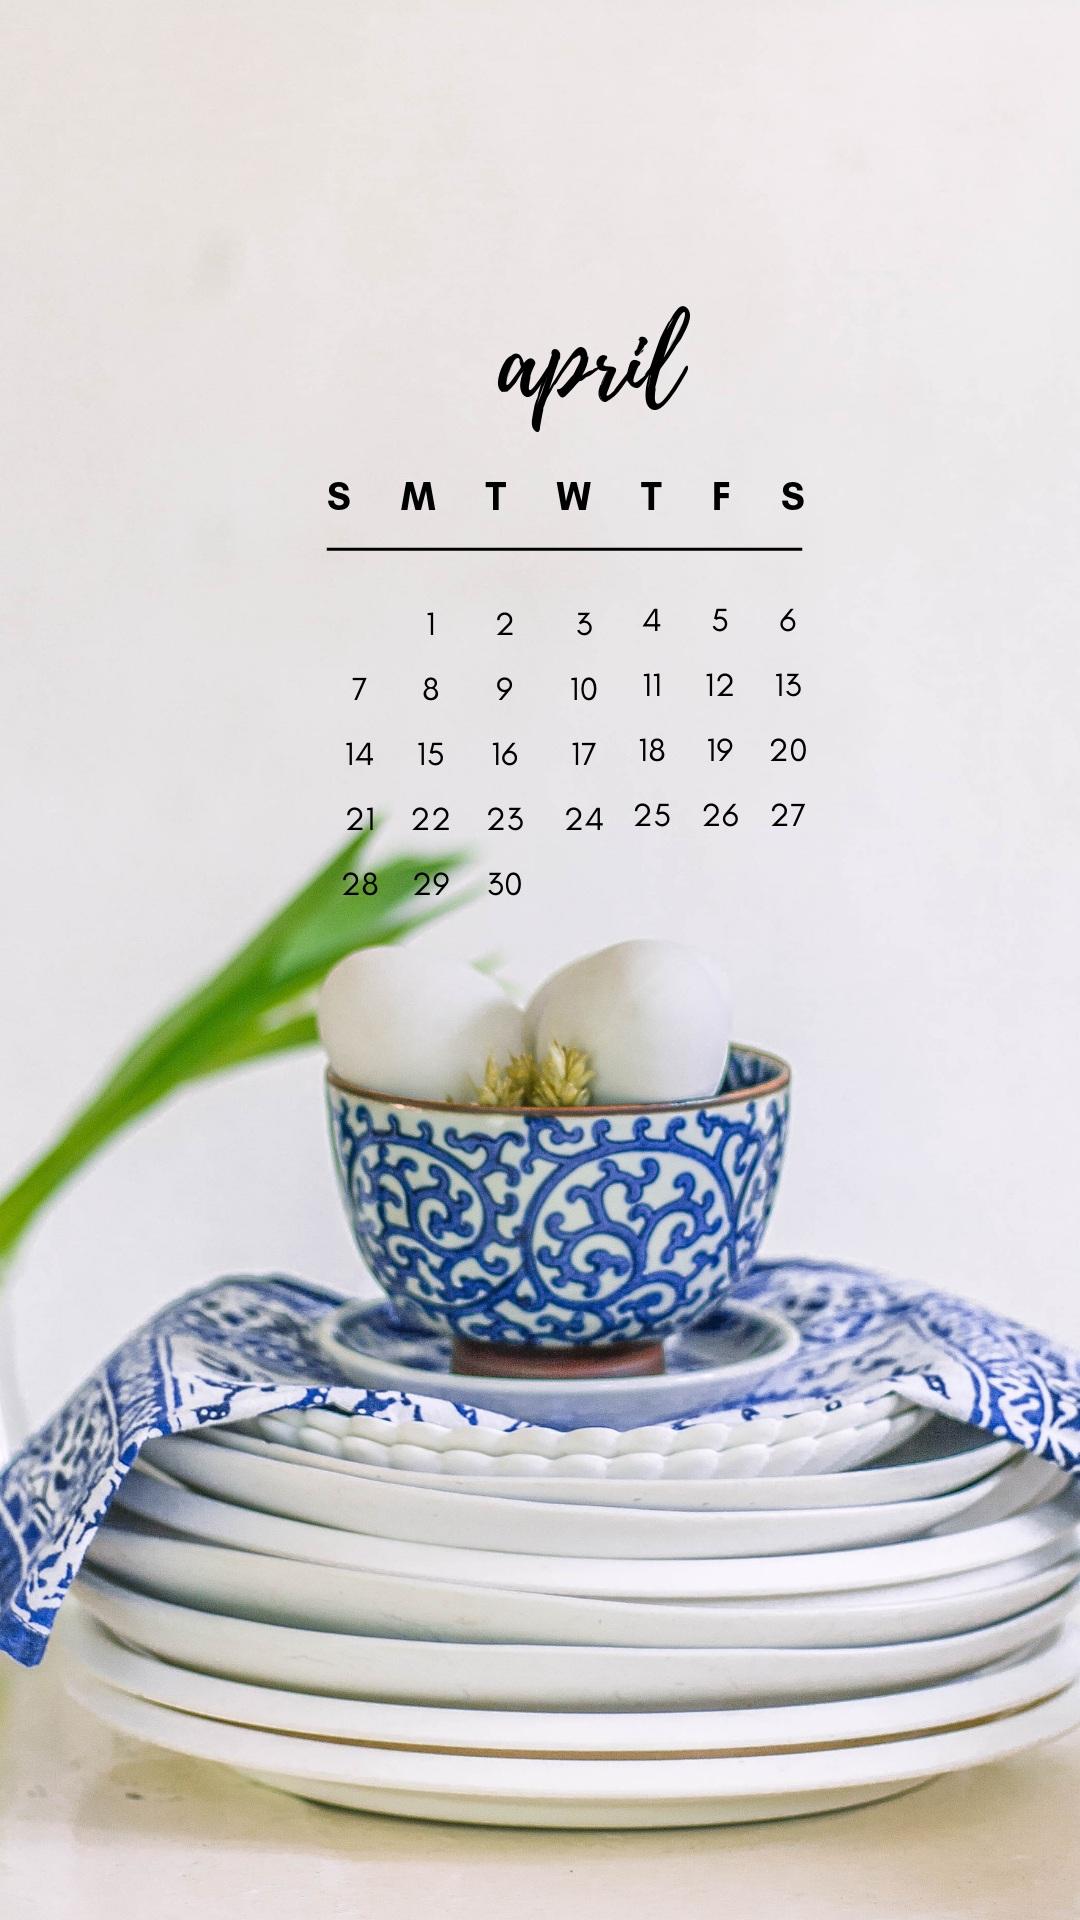 iphone april 2019 calendar.png